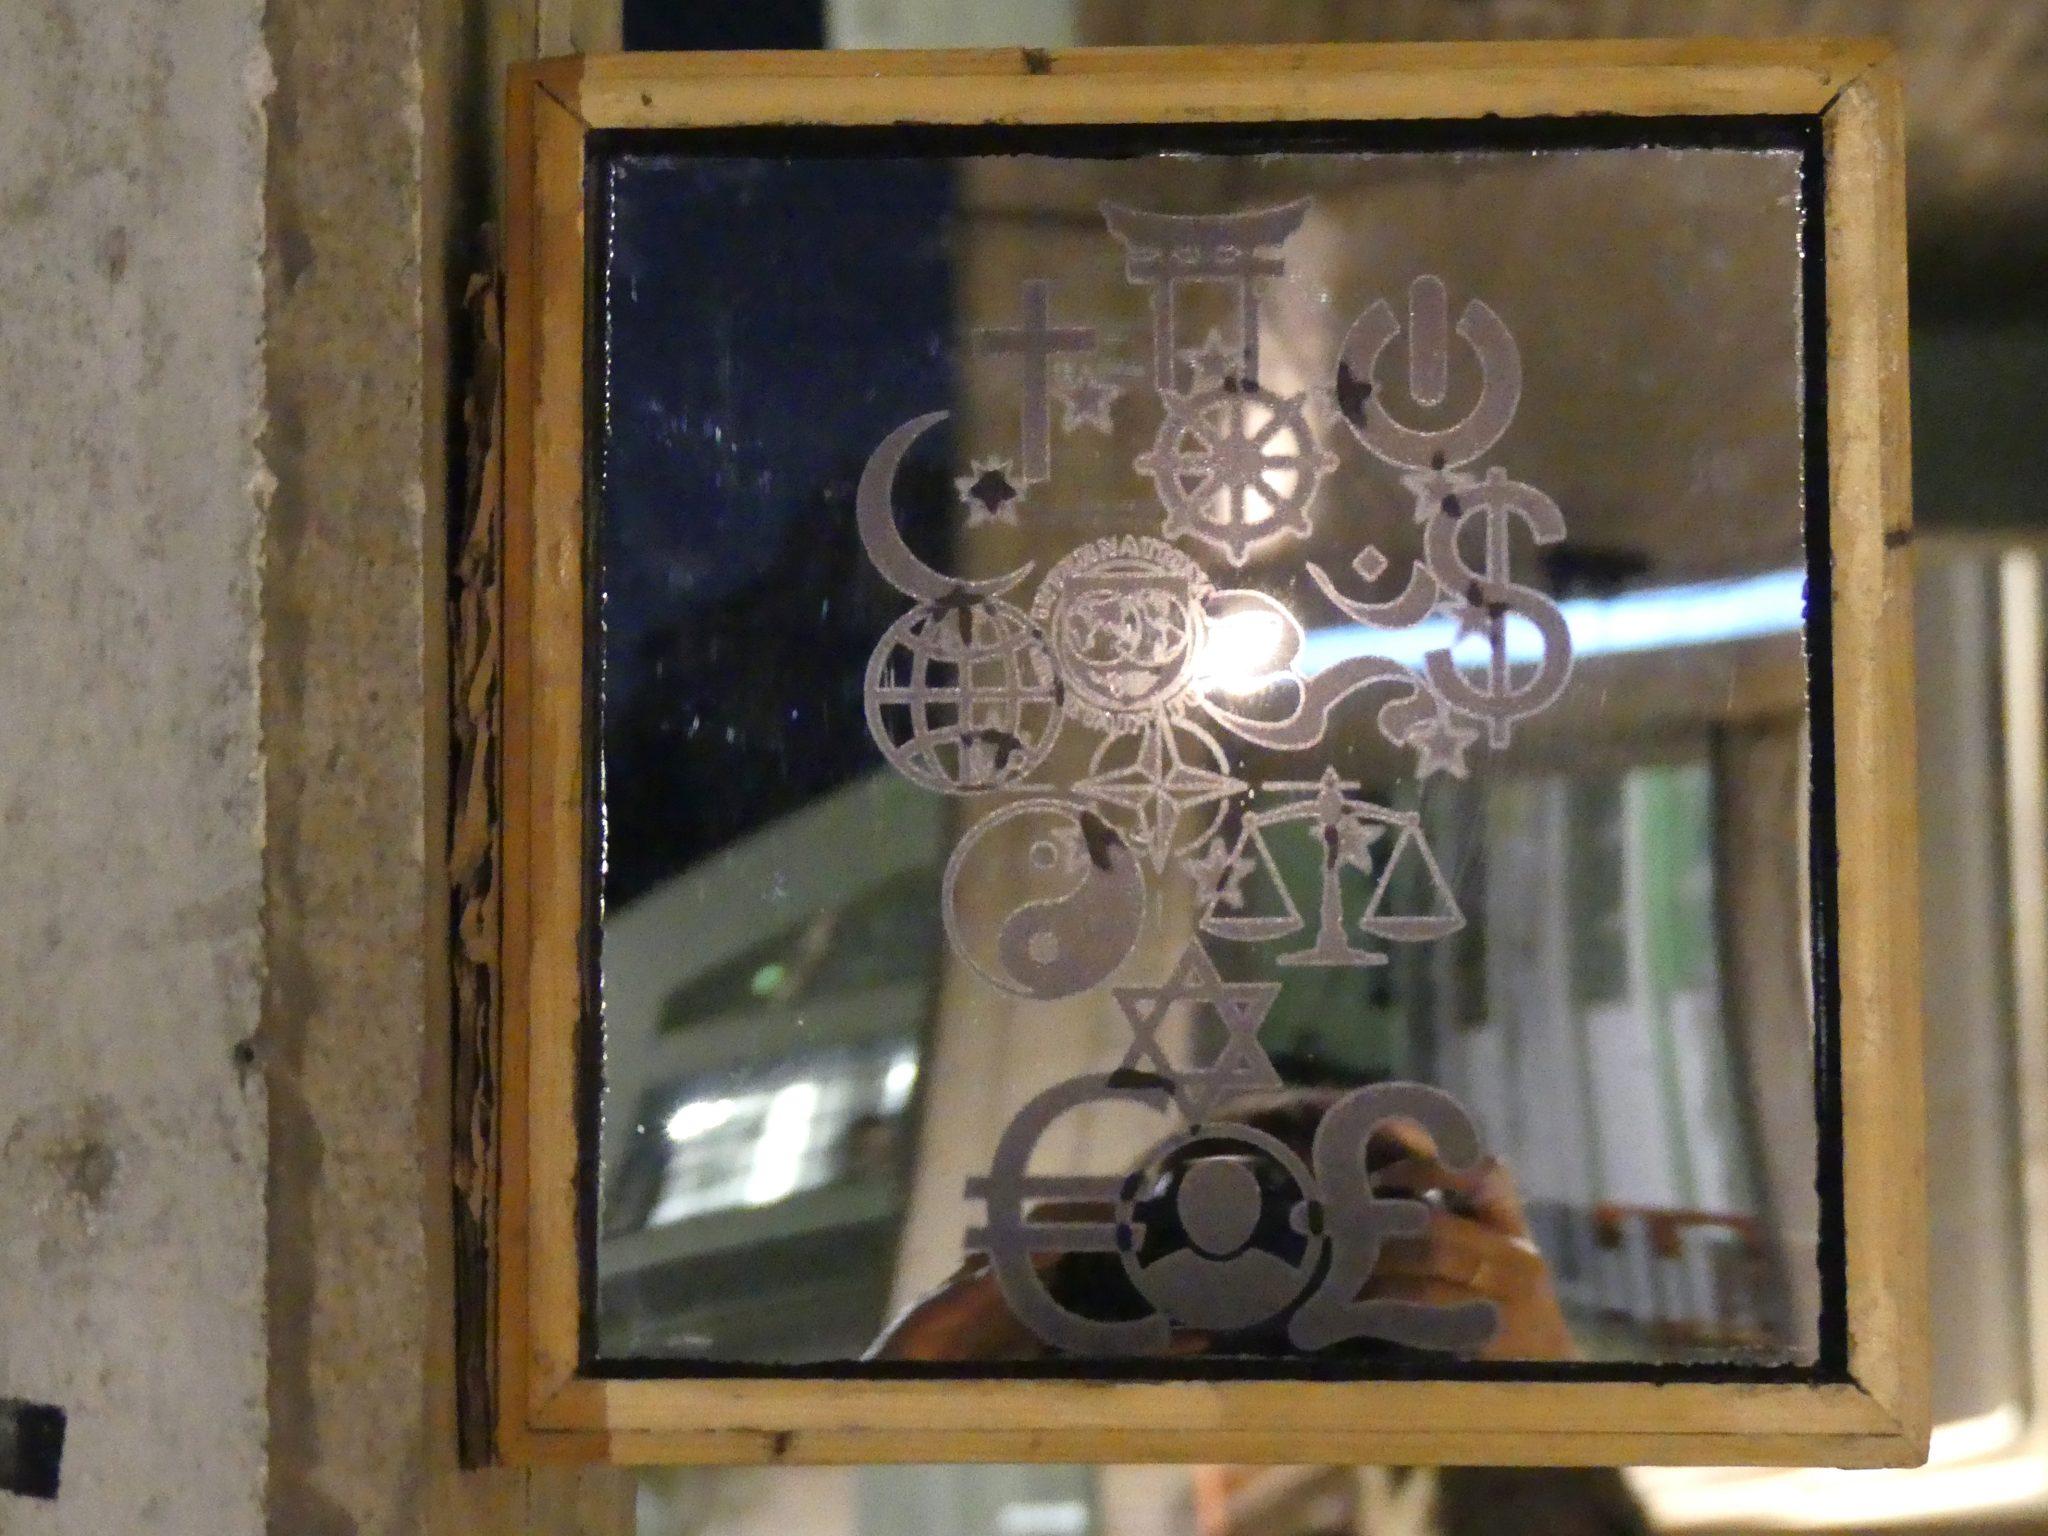 tidal flow art rubick's cube κύβος του Ρούμπικ ΑΣΚΤ ASFA 11